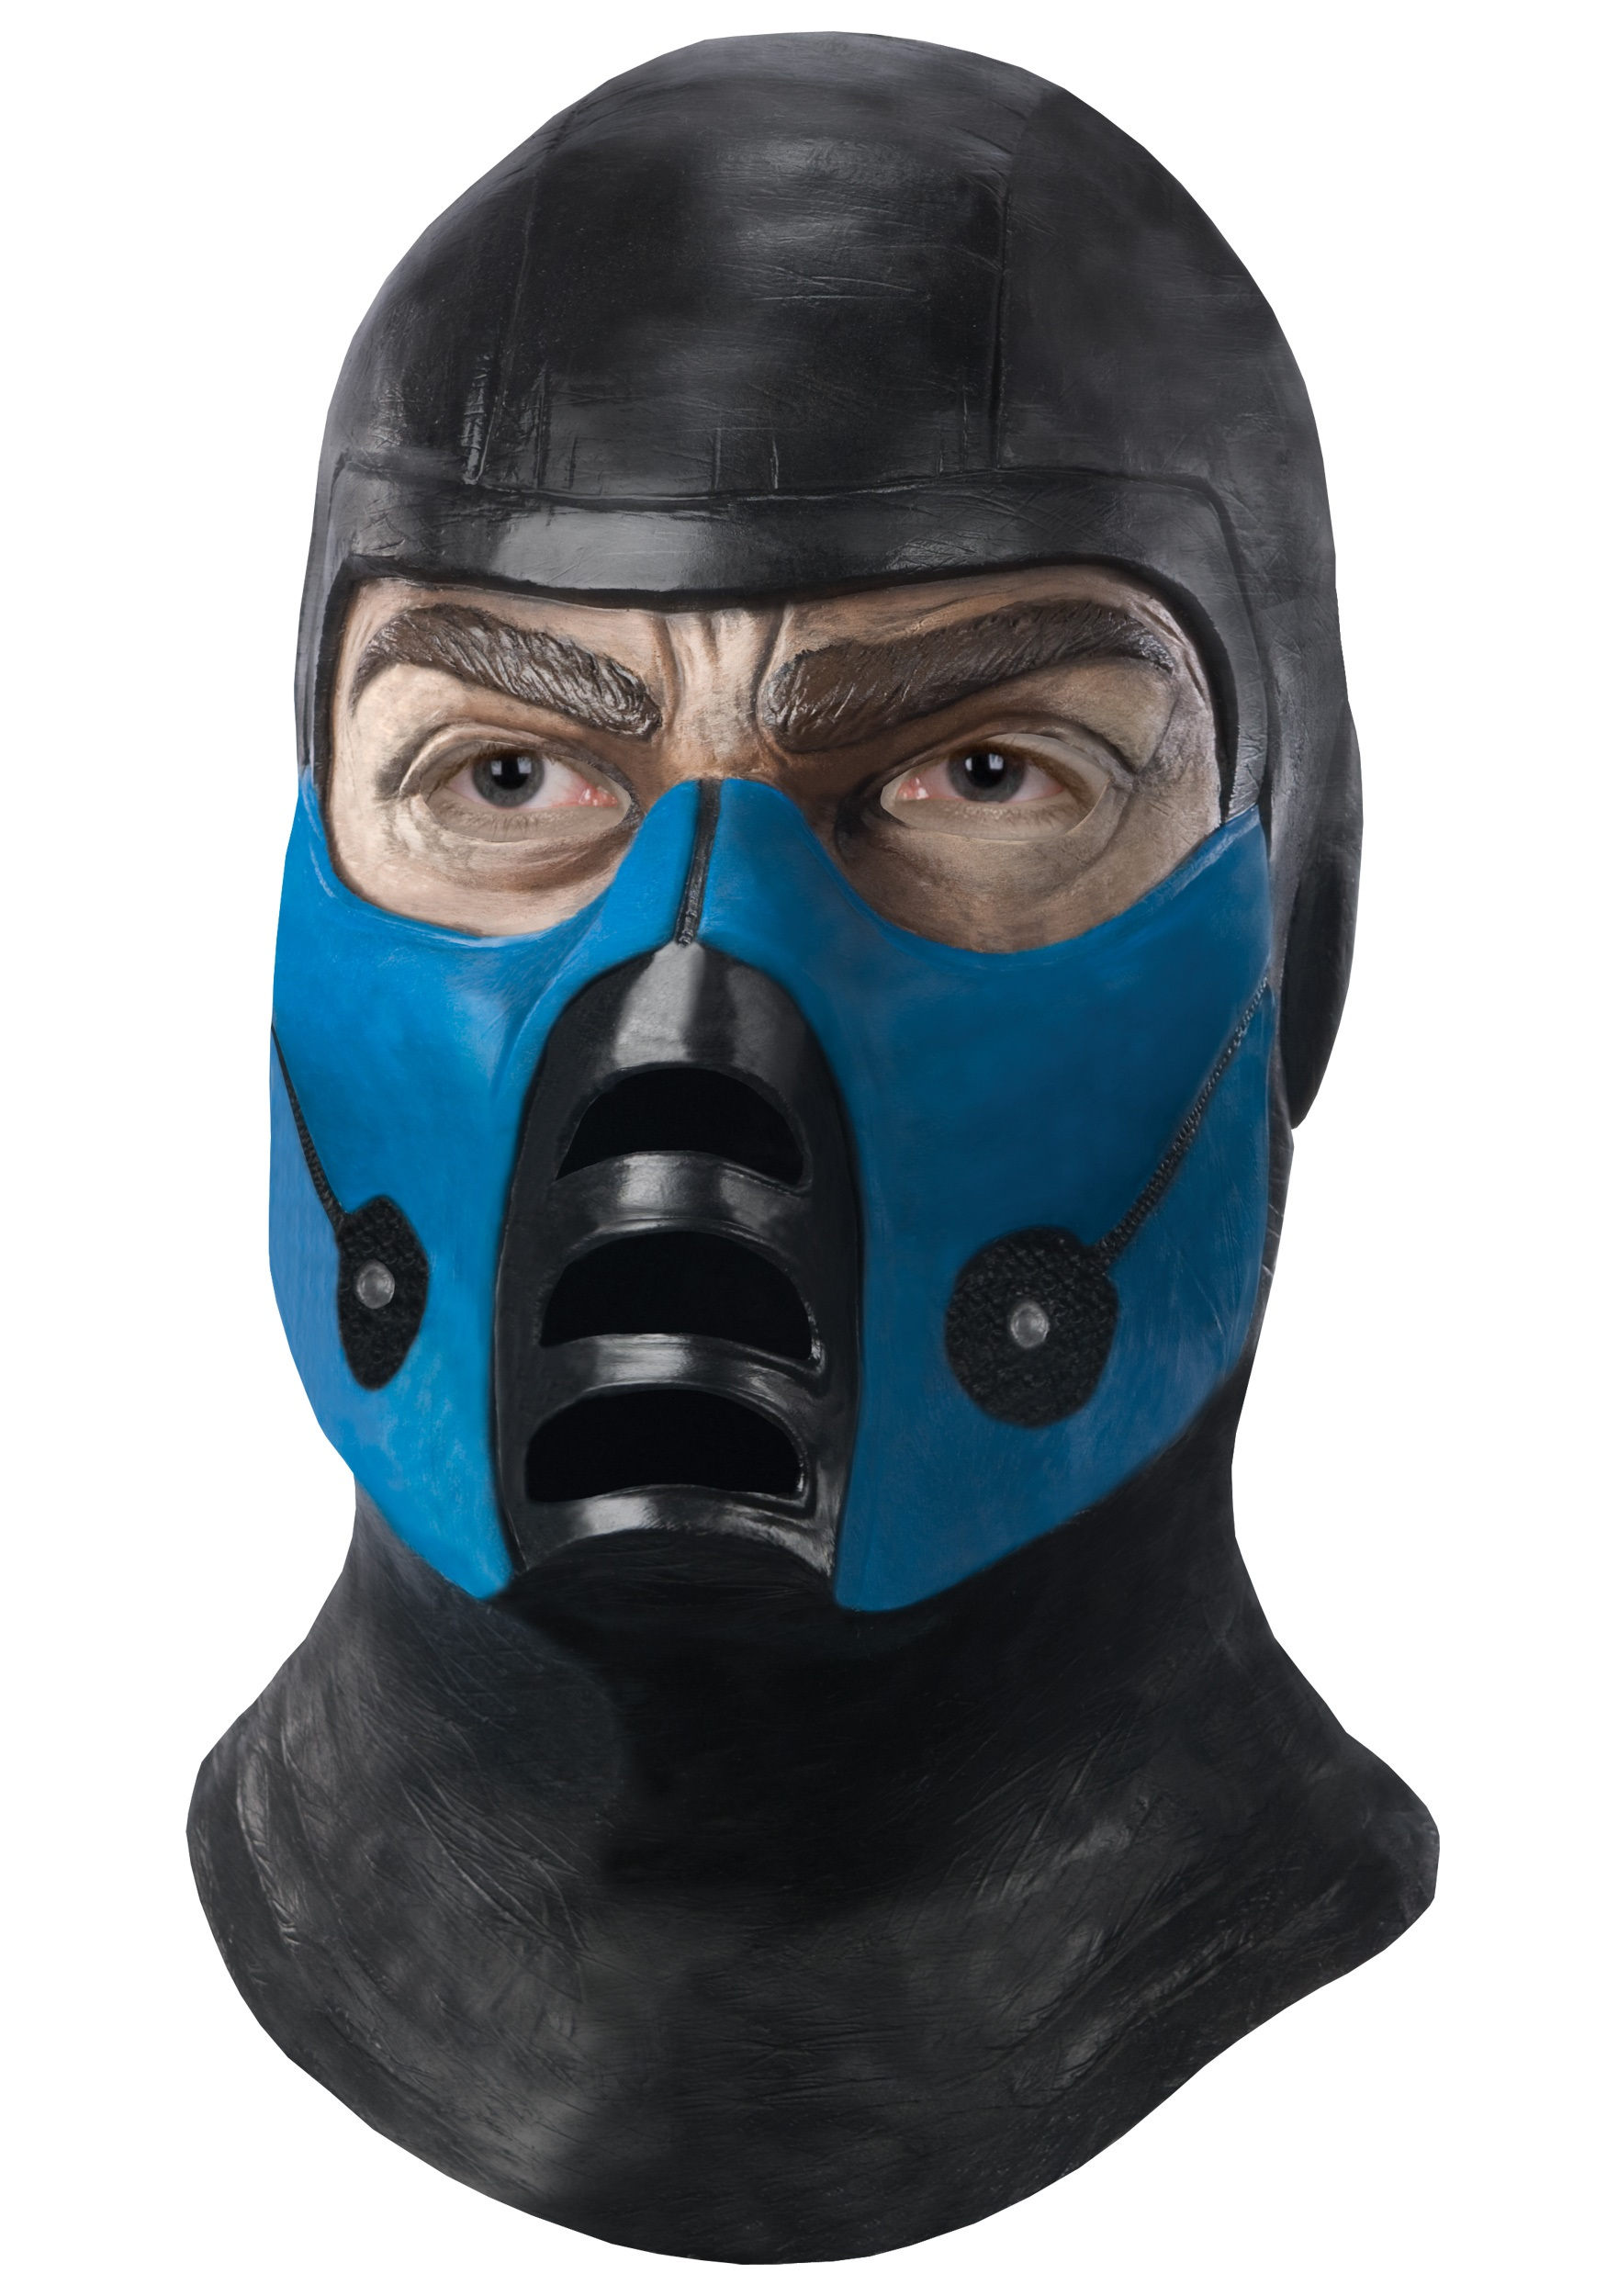 Deluxe Sub Zero Mask Halloween Costume Ideas 2019